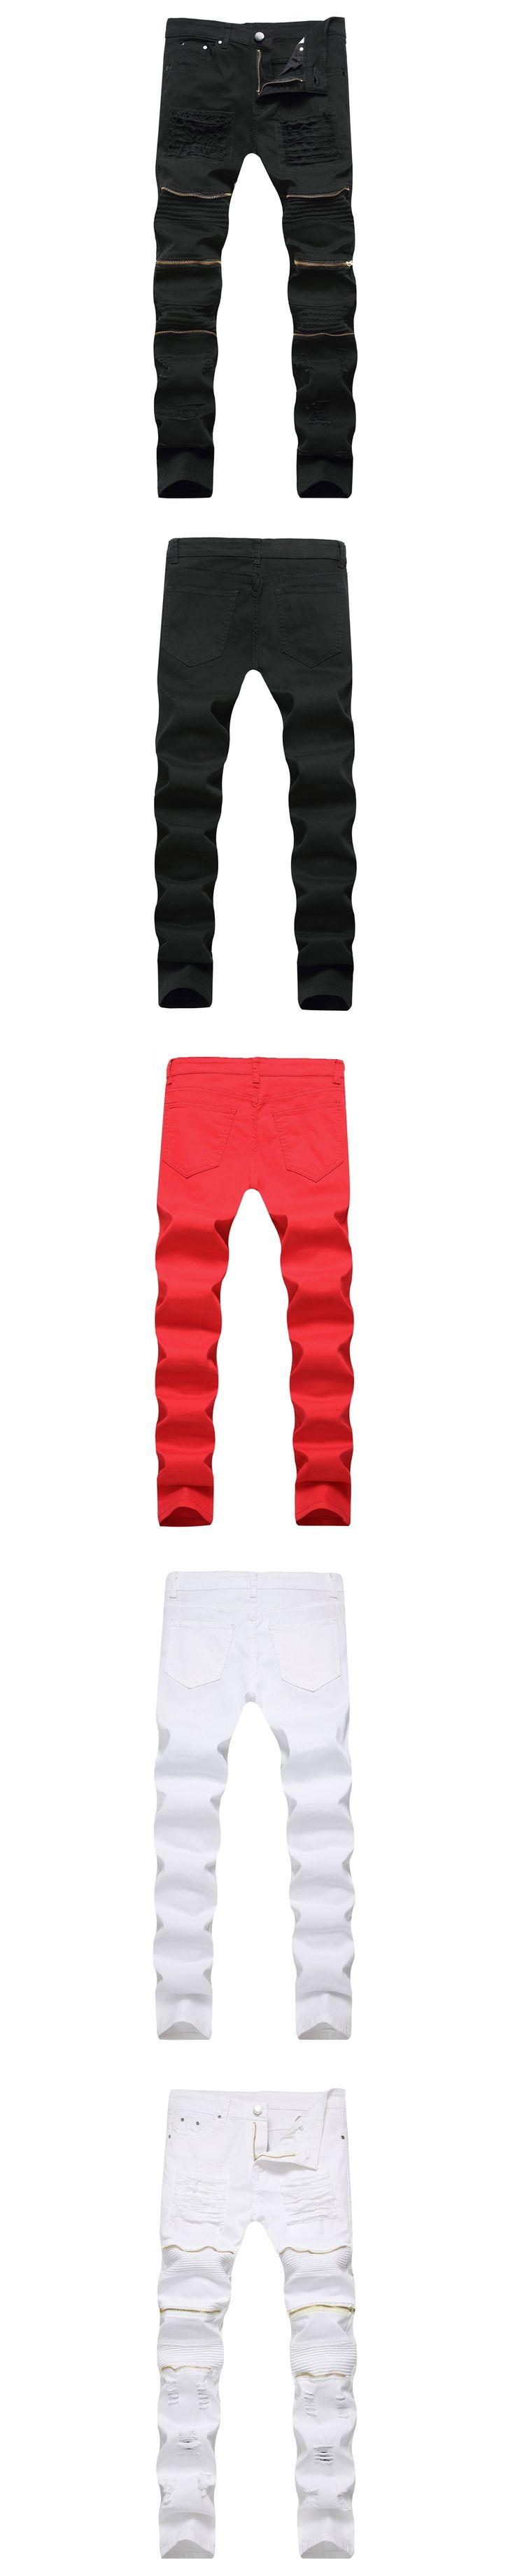 White Black Red Zipper Jeans Men Slim Fit Stretch Ripped Distressed Mens Biker Jeans Skinny HHip Hop Pants